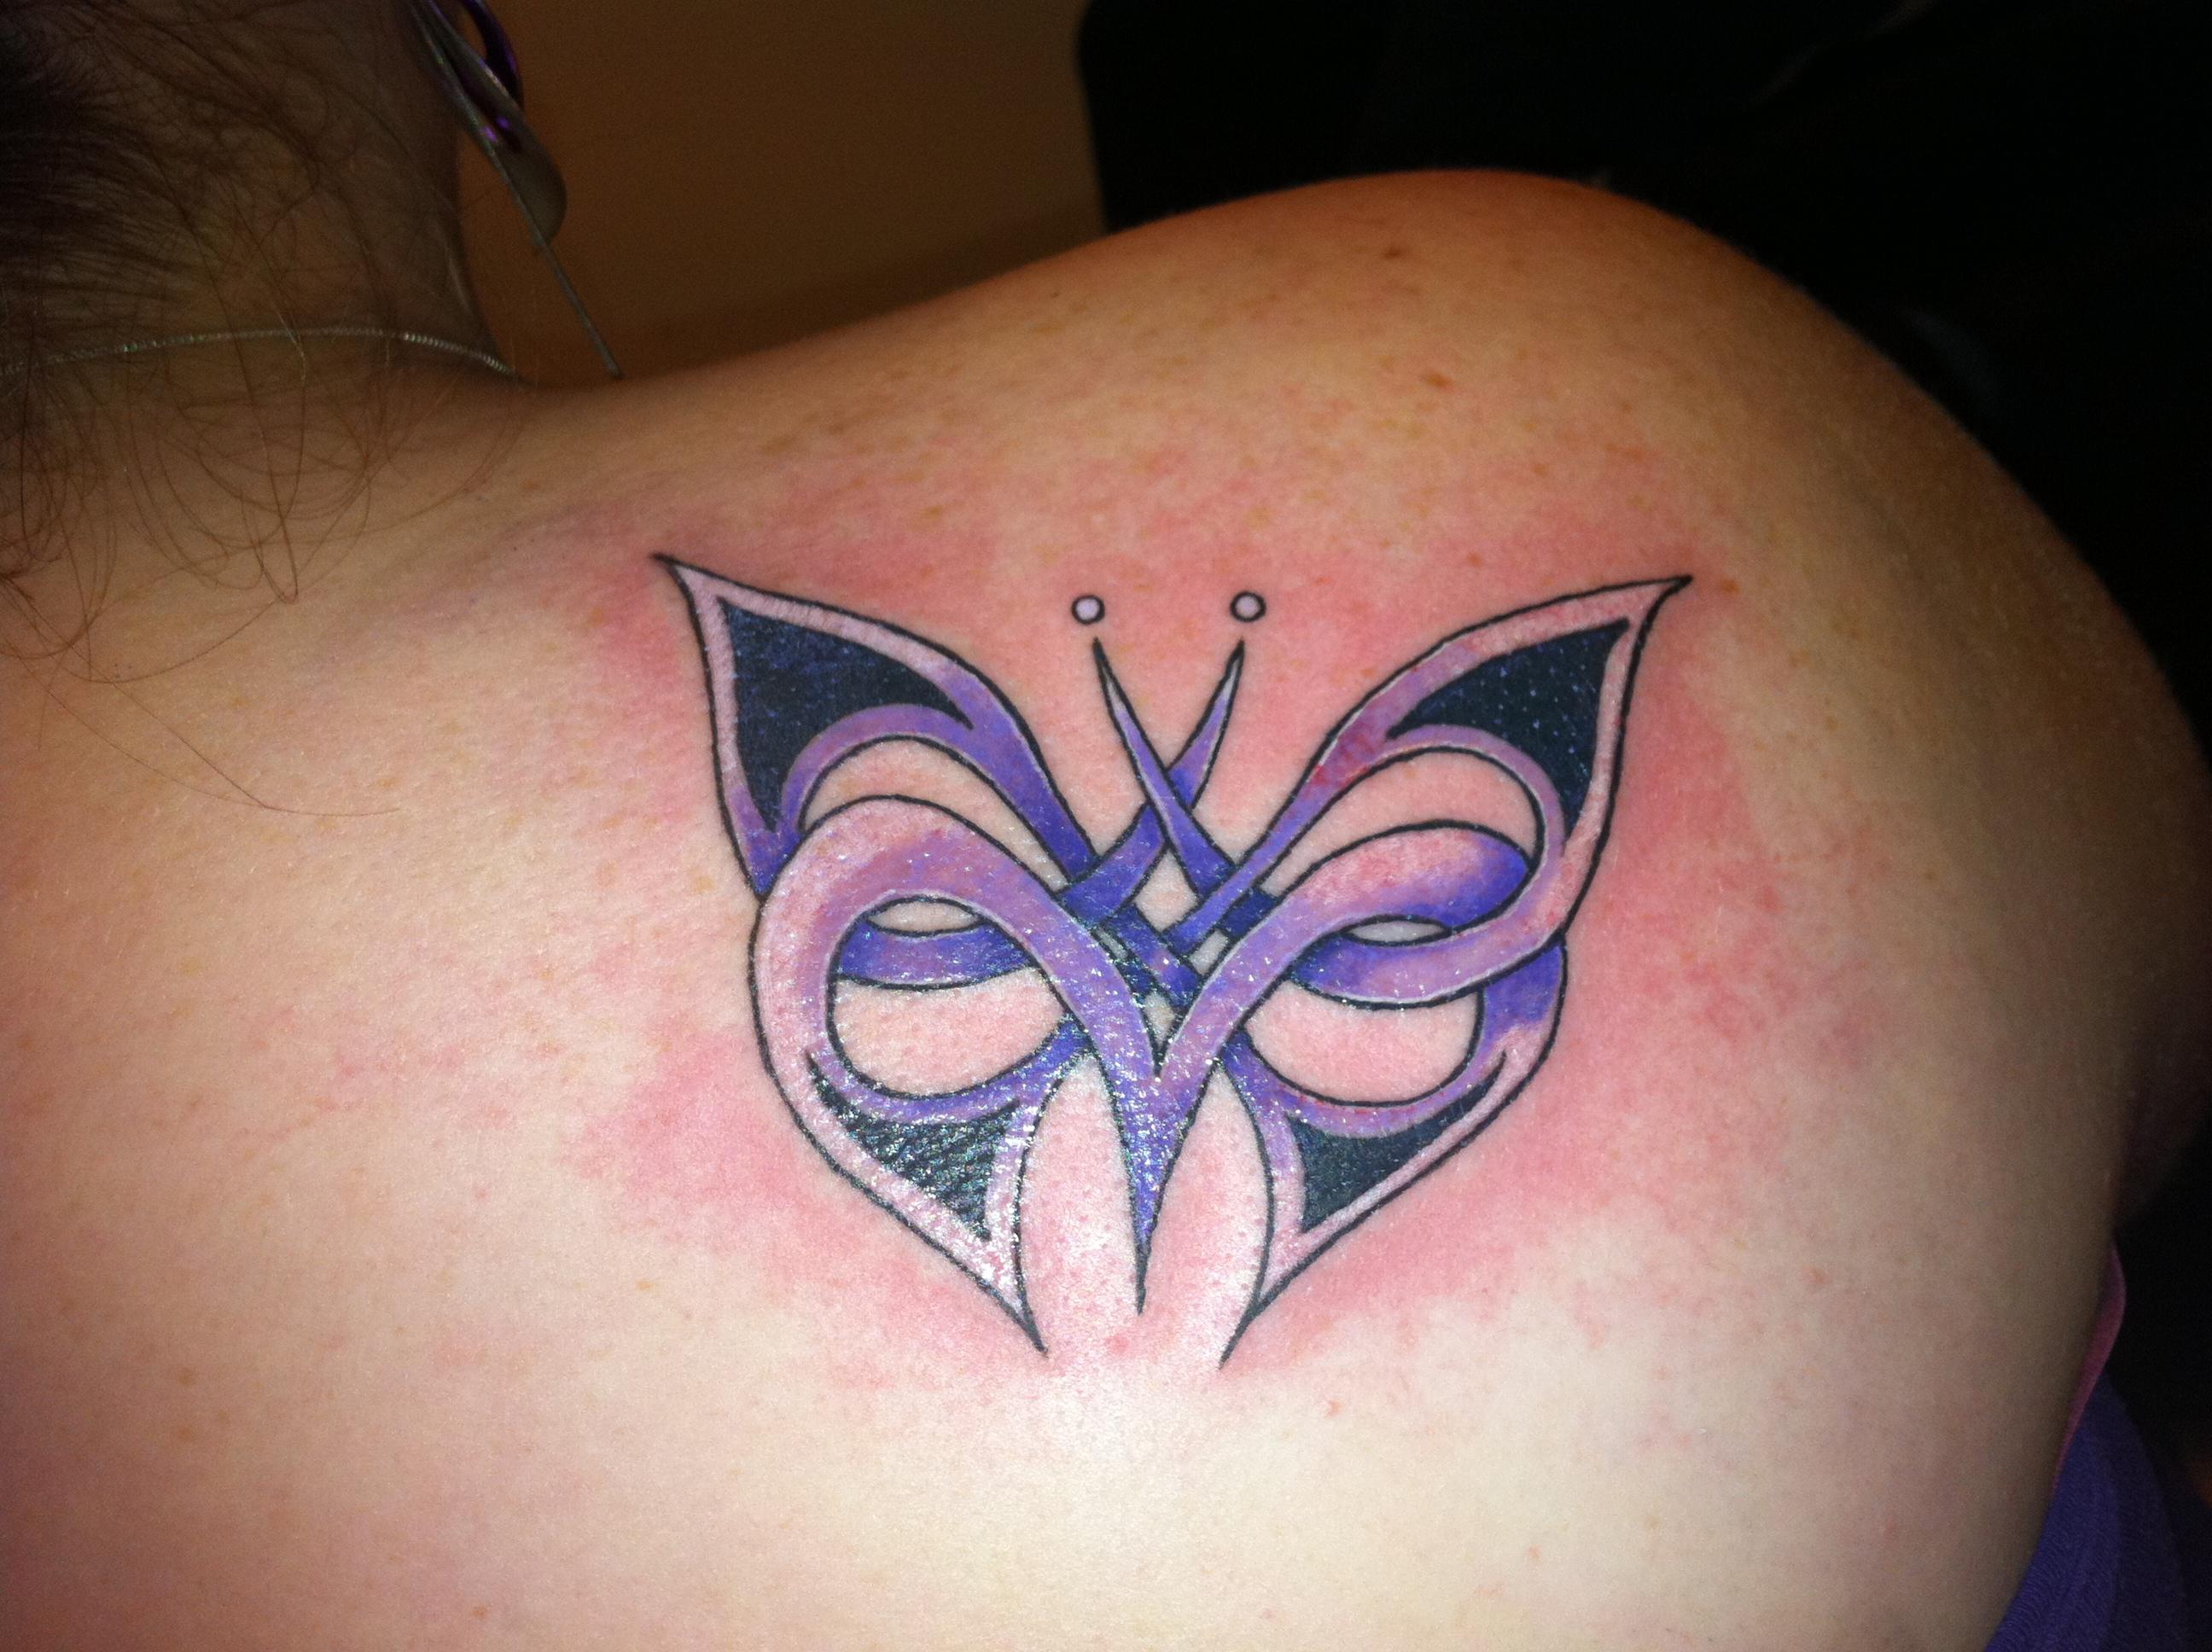 tatuaje de mariposa tribal Imagenes de Tatuajes Tribales